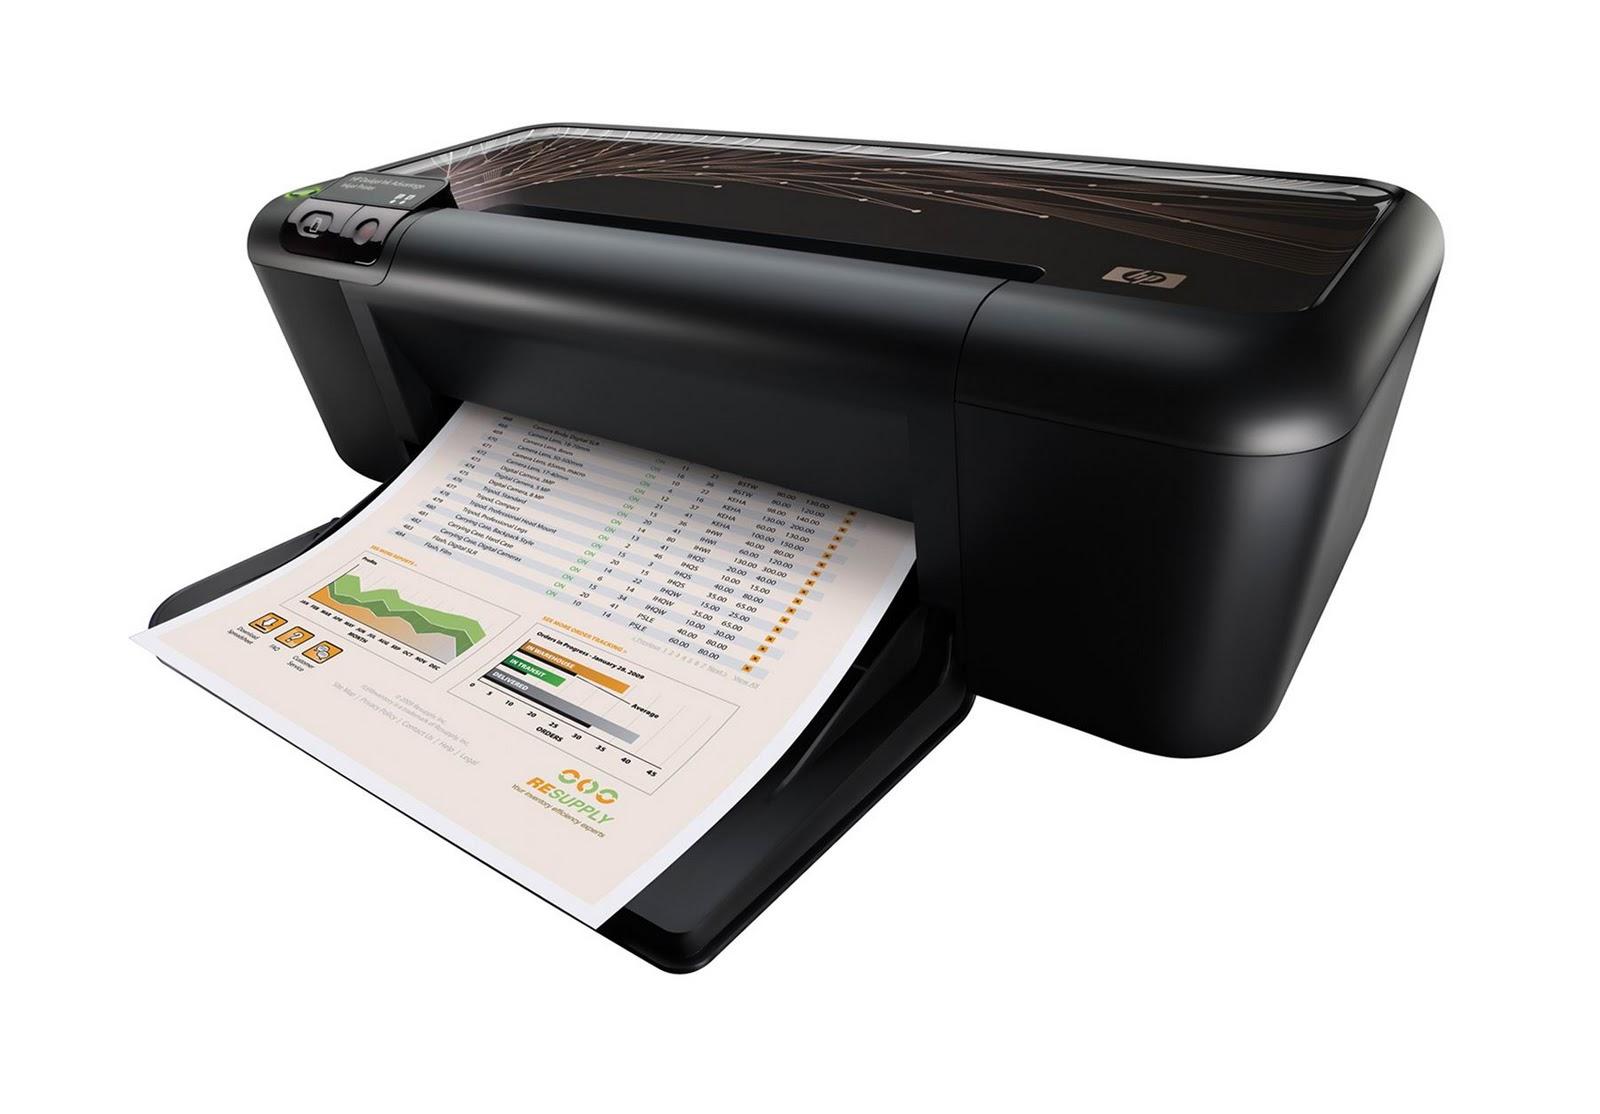 Hewlett Packard Printer Driver Downloads - disastrousbeating